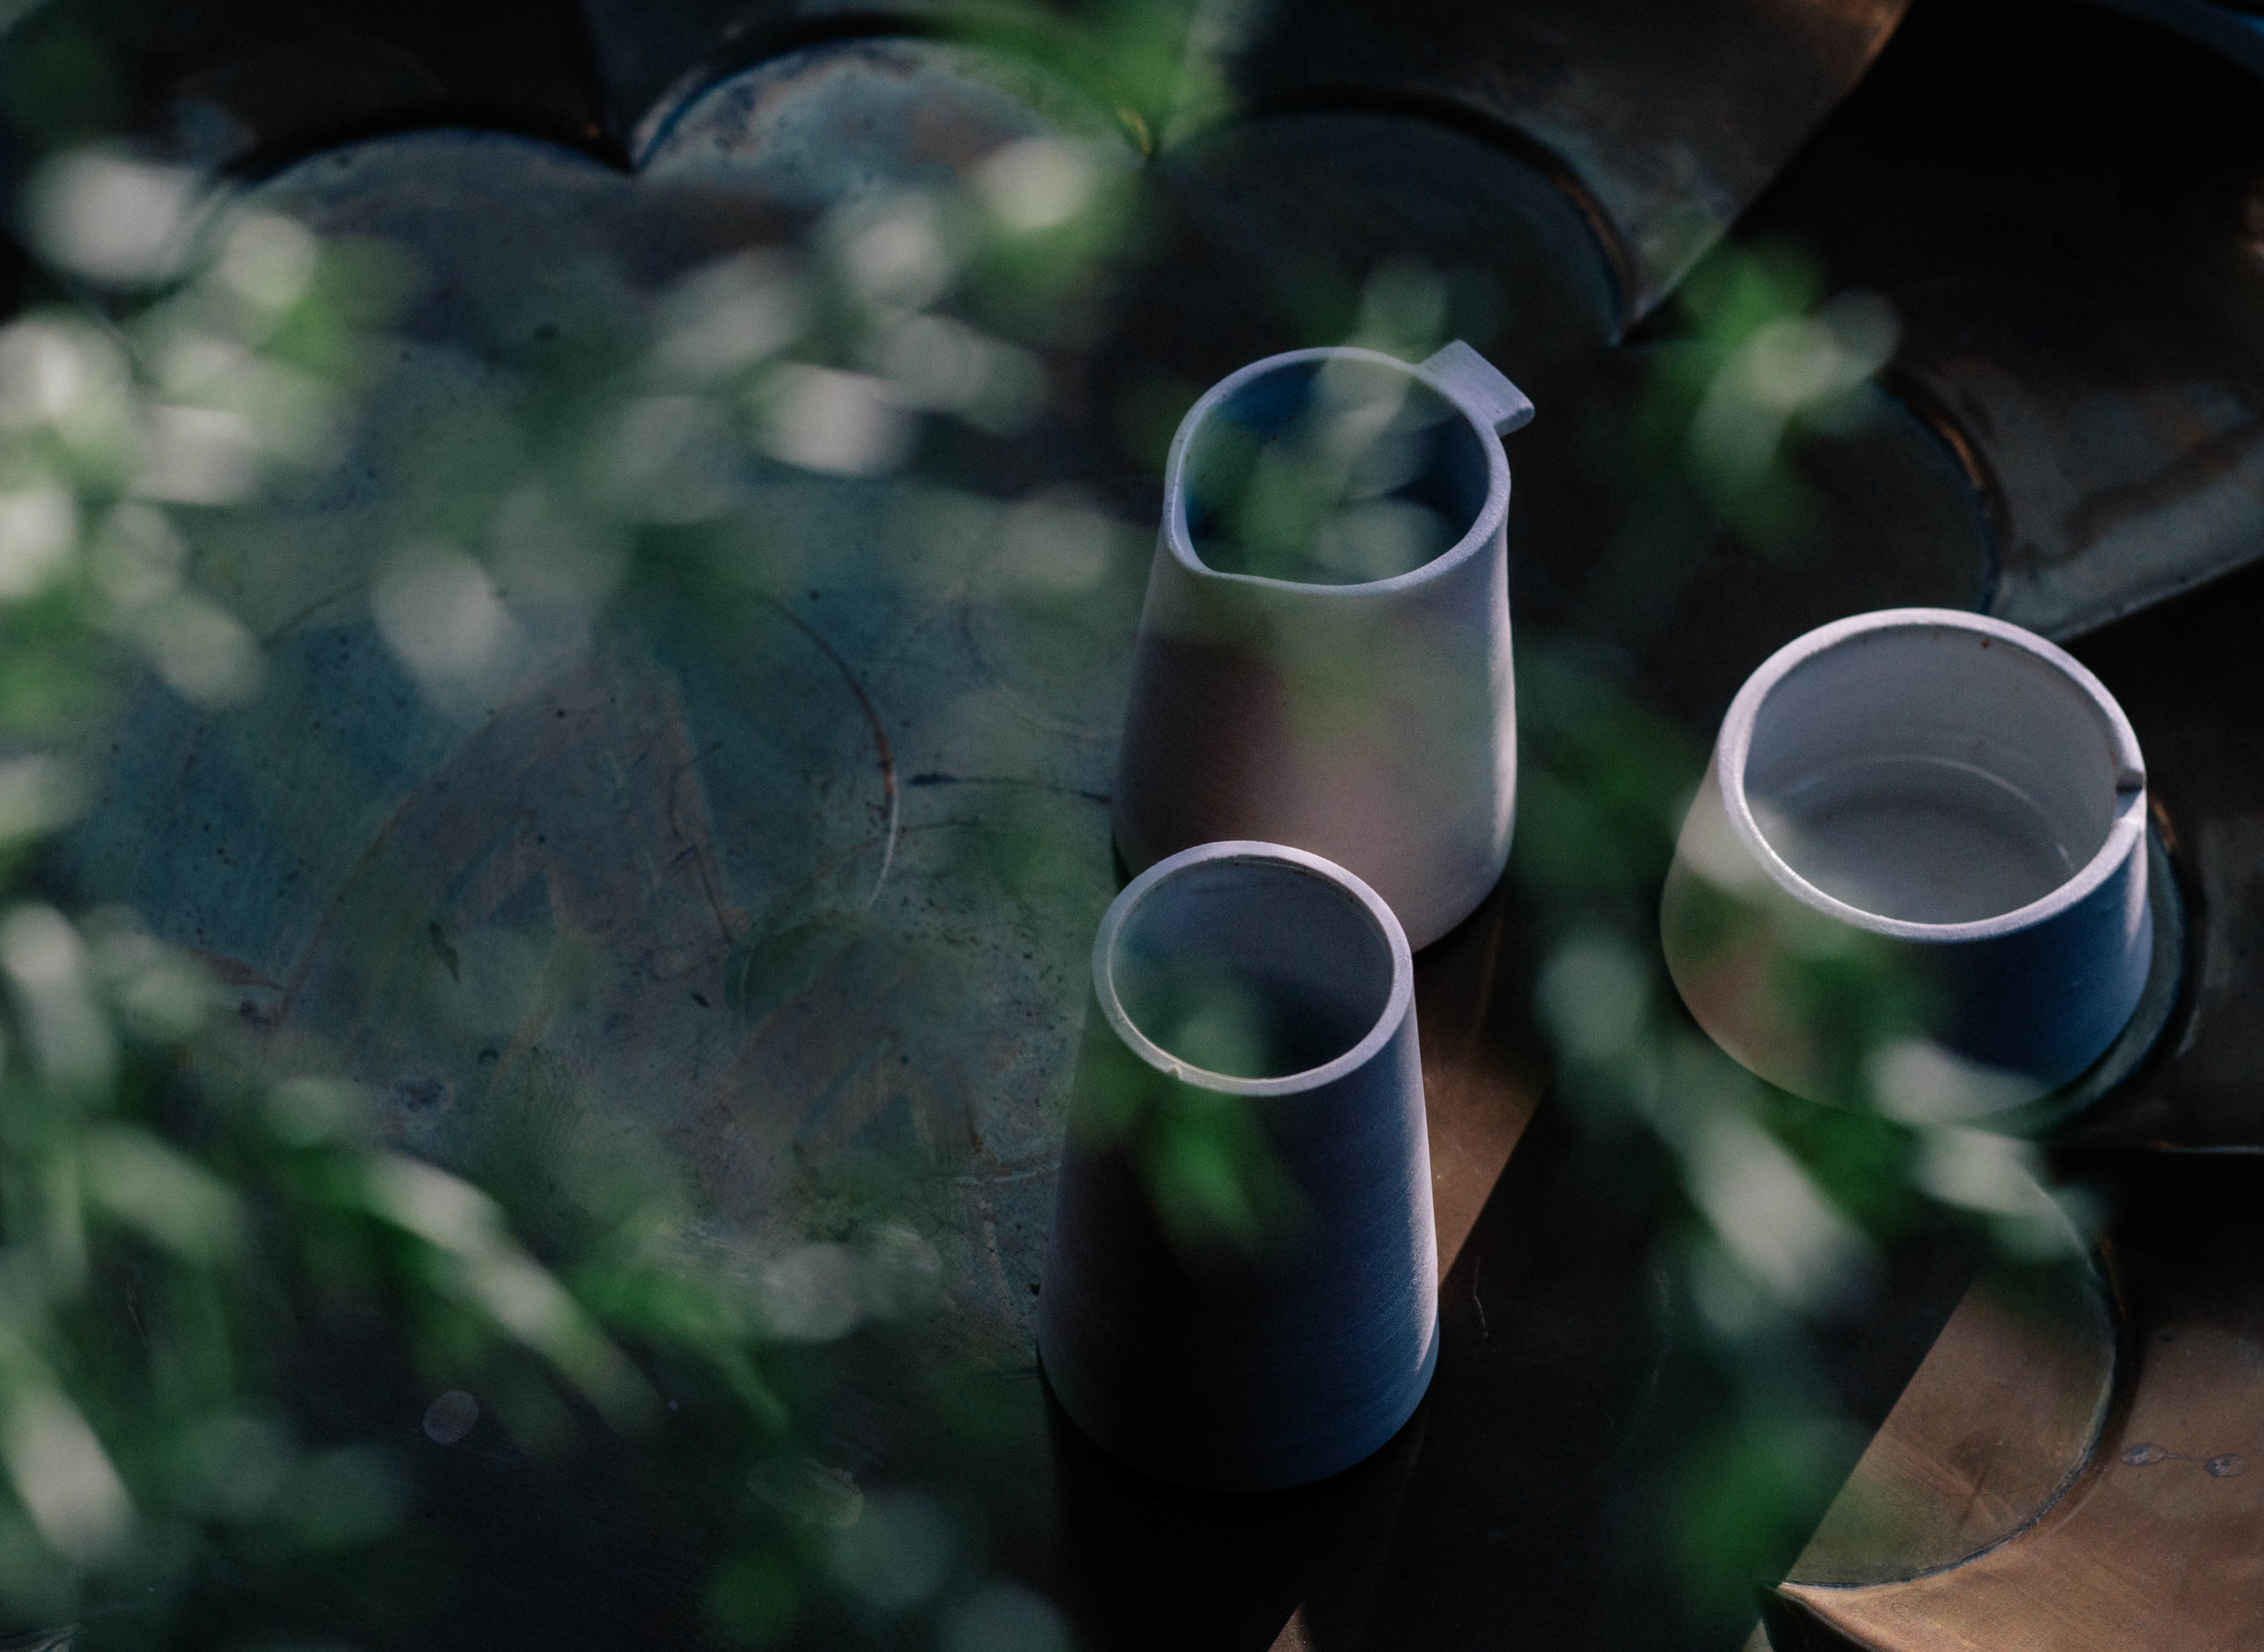 jono smart and green plant.jpg